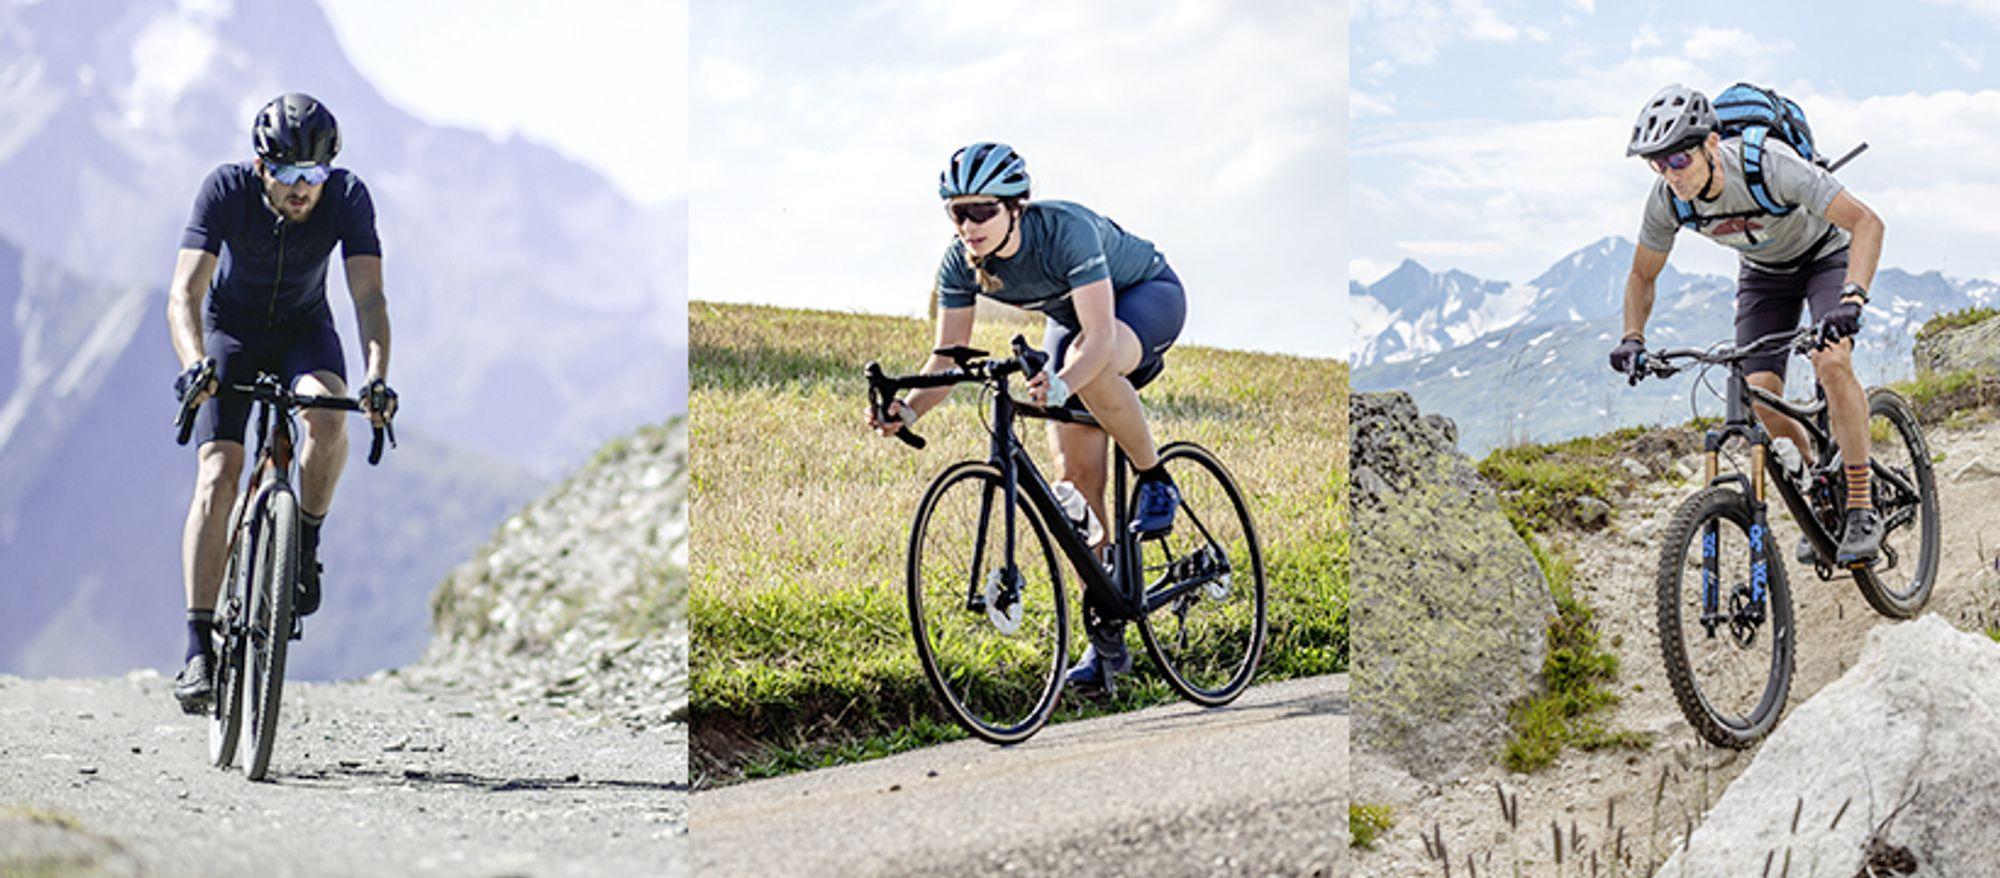 Cycle Hero by Shimano:   Wettkampf in drei Disziplinen